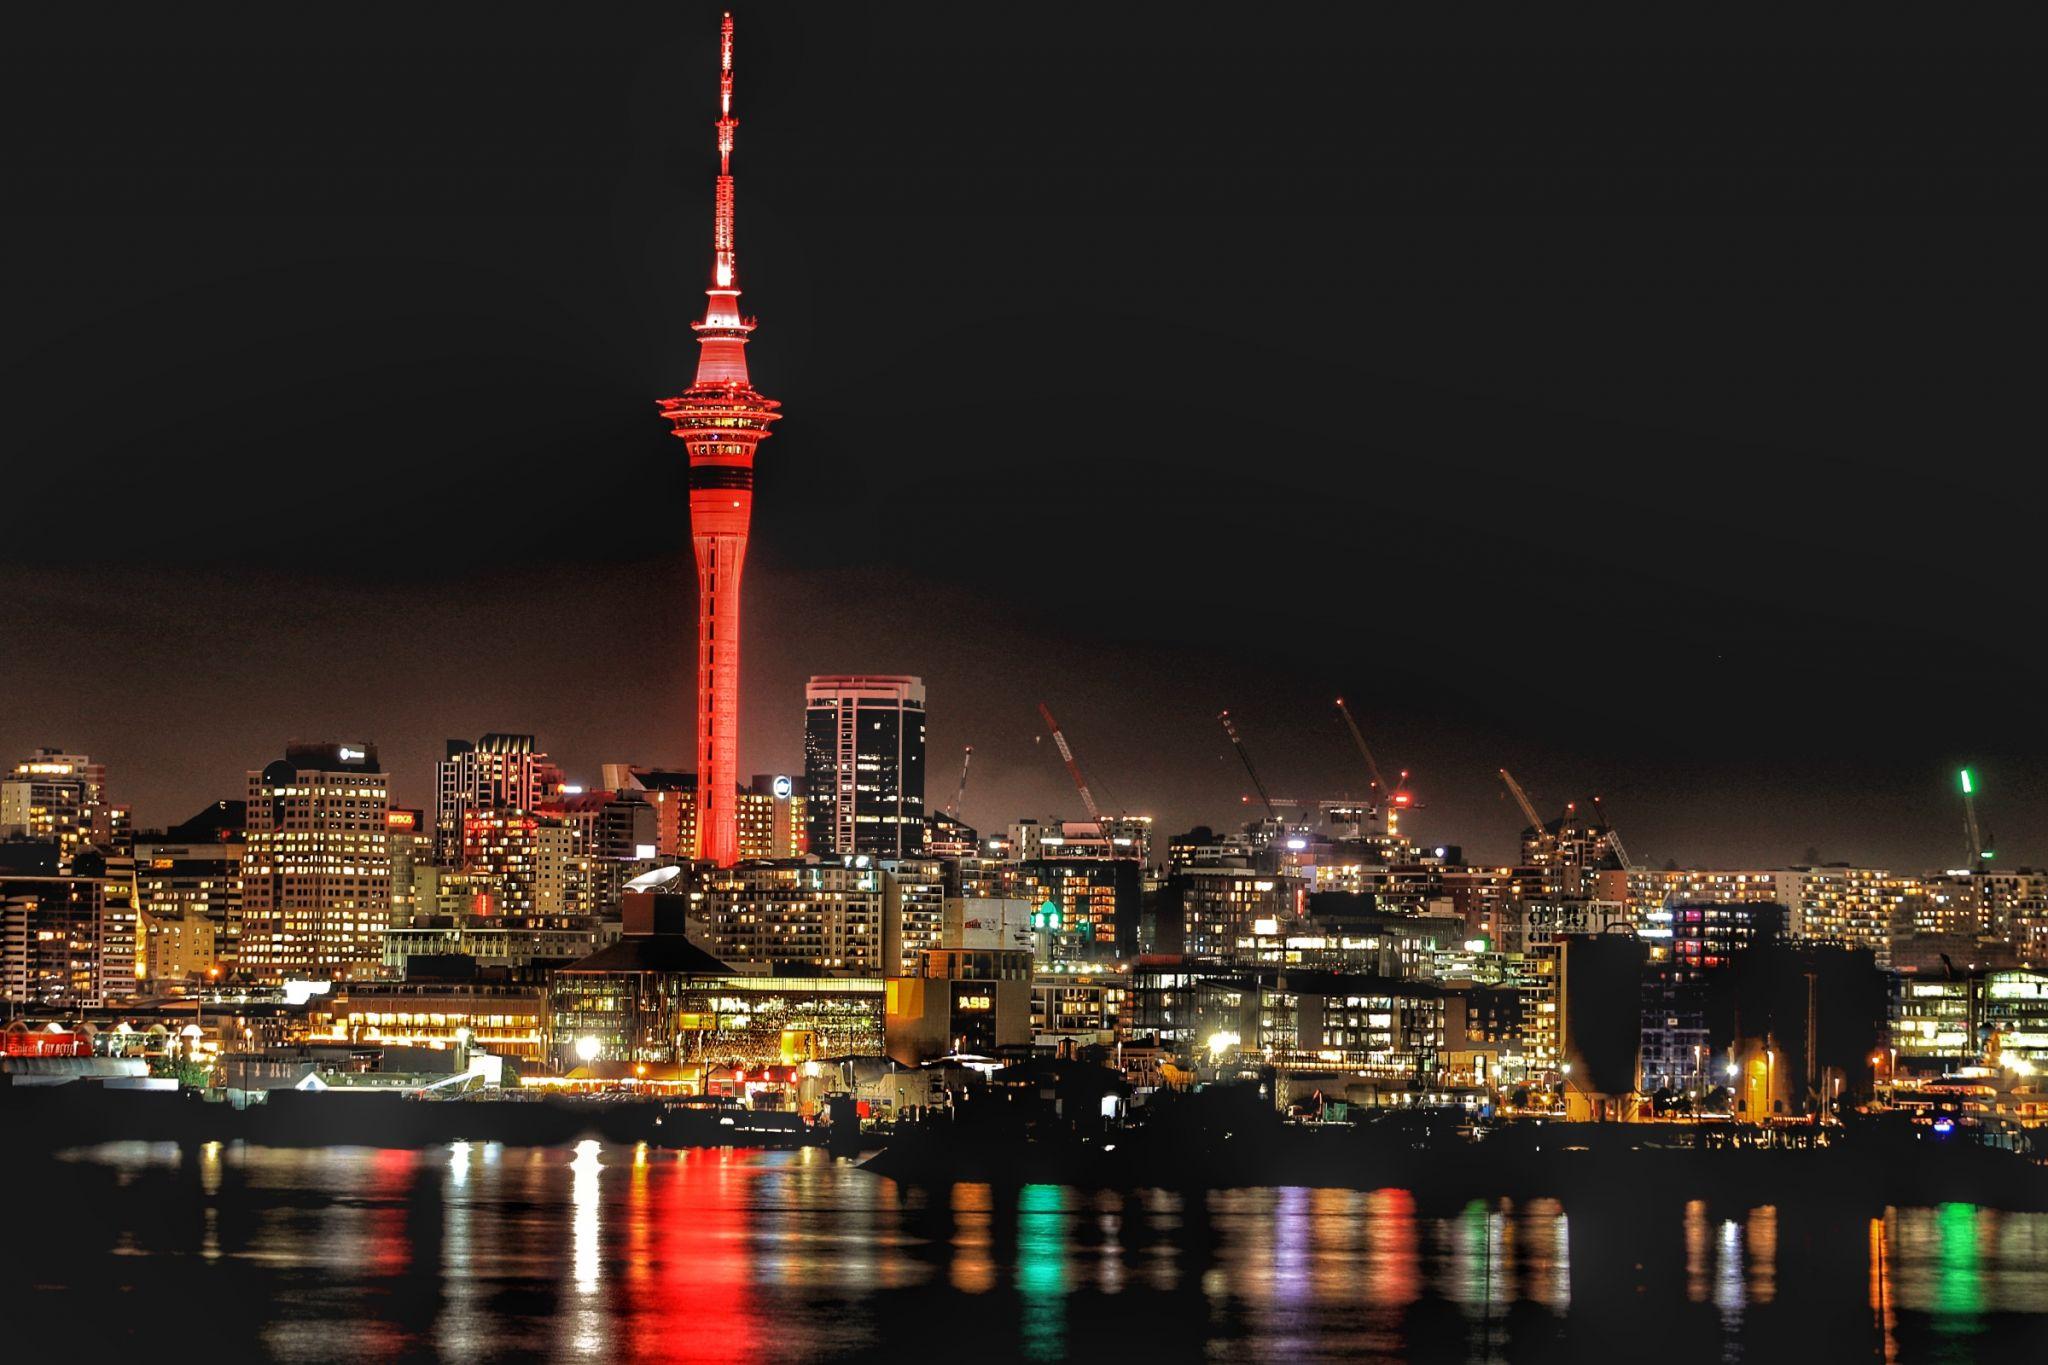 Auckland's Sky Tower & CBD at night, New Zealand